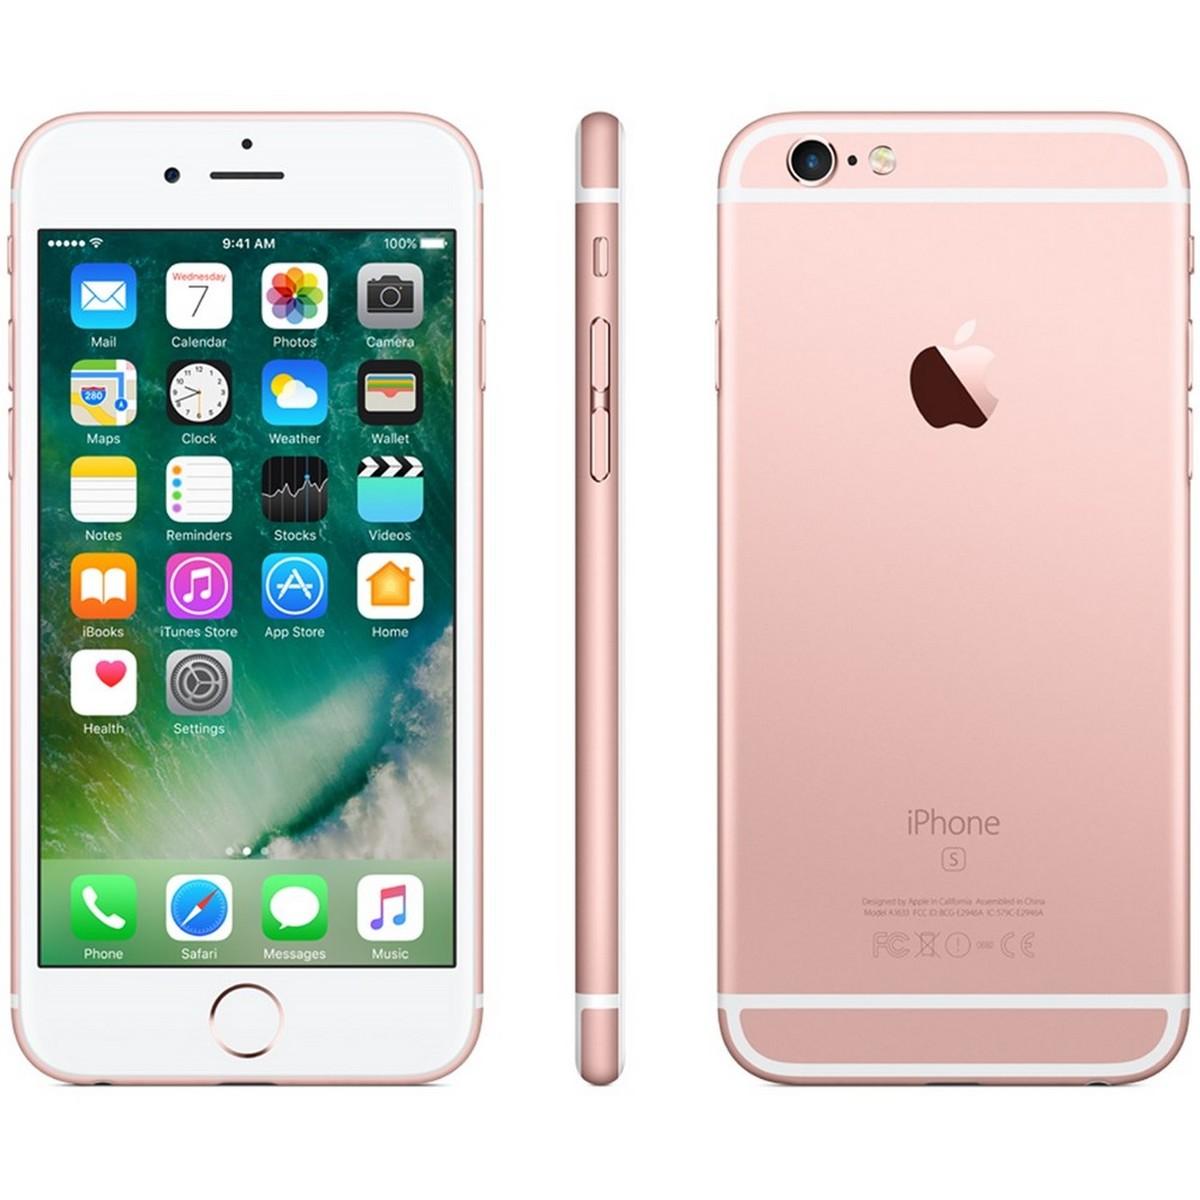 Apple Iphone 6s Plus 32gb Rose Gold - Iphone 6s Plus 32 Gb Rose Gold - HD Wallpaper